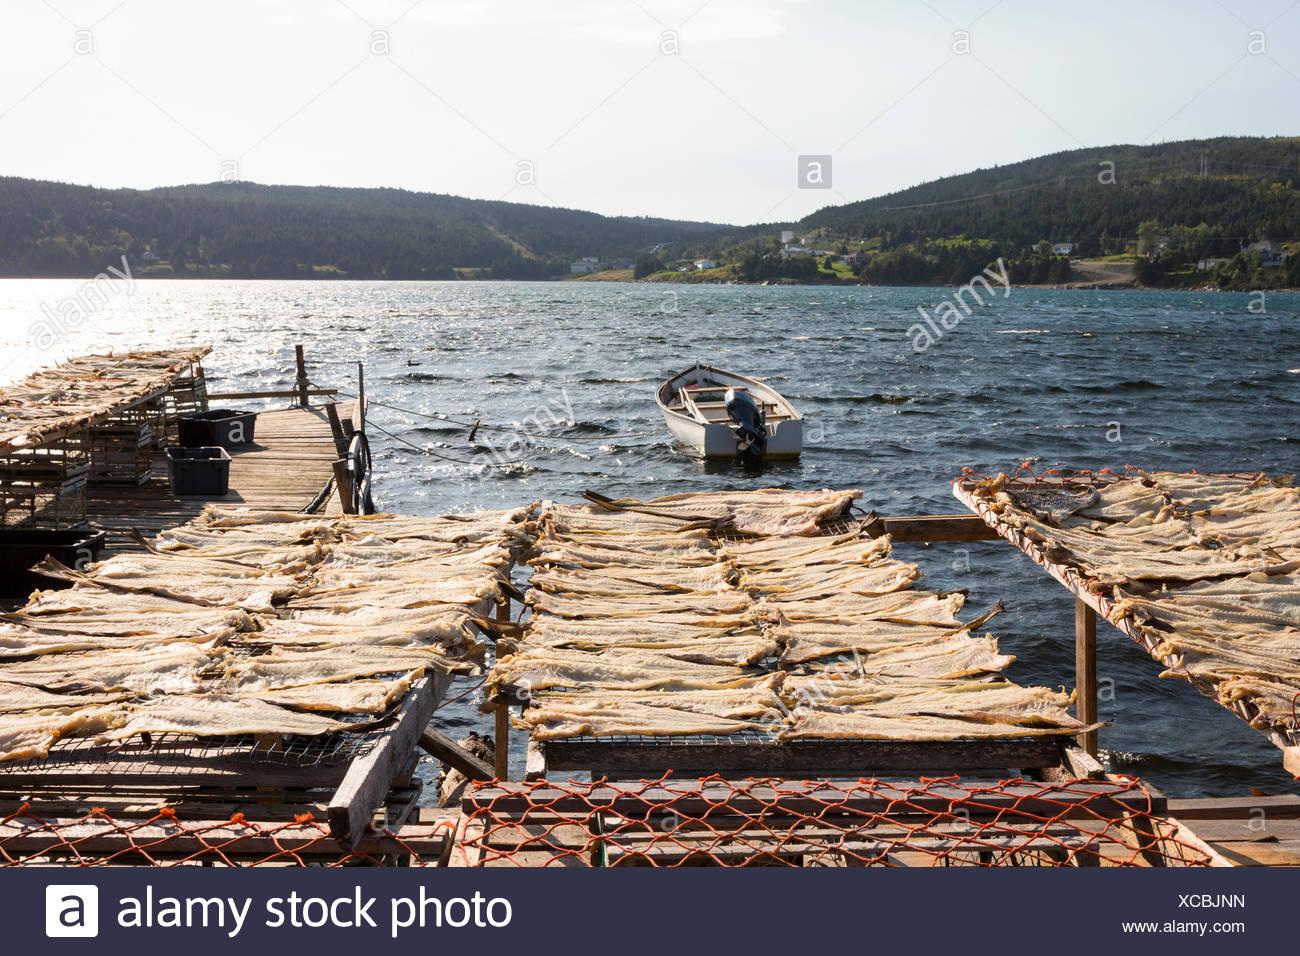 Cod tendederos, Corazón Contento, Newfoundland, Canadá Imagen De Stock